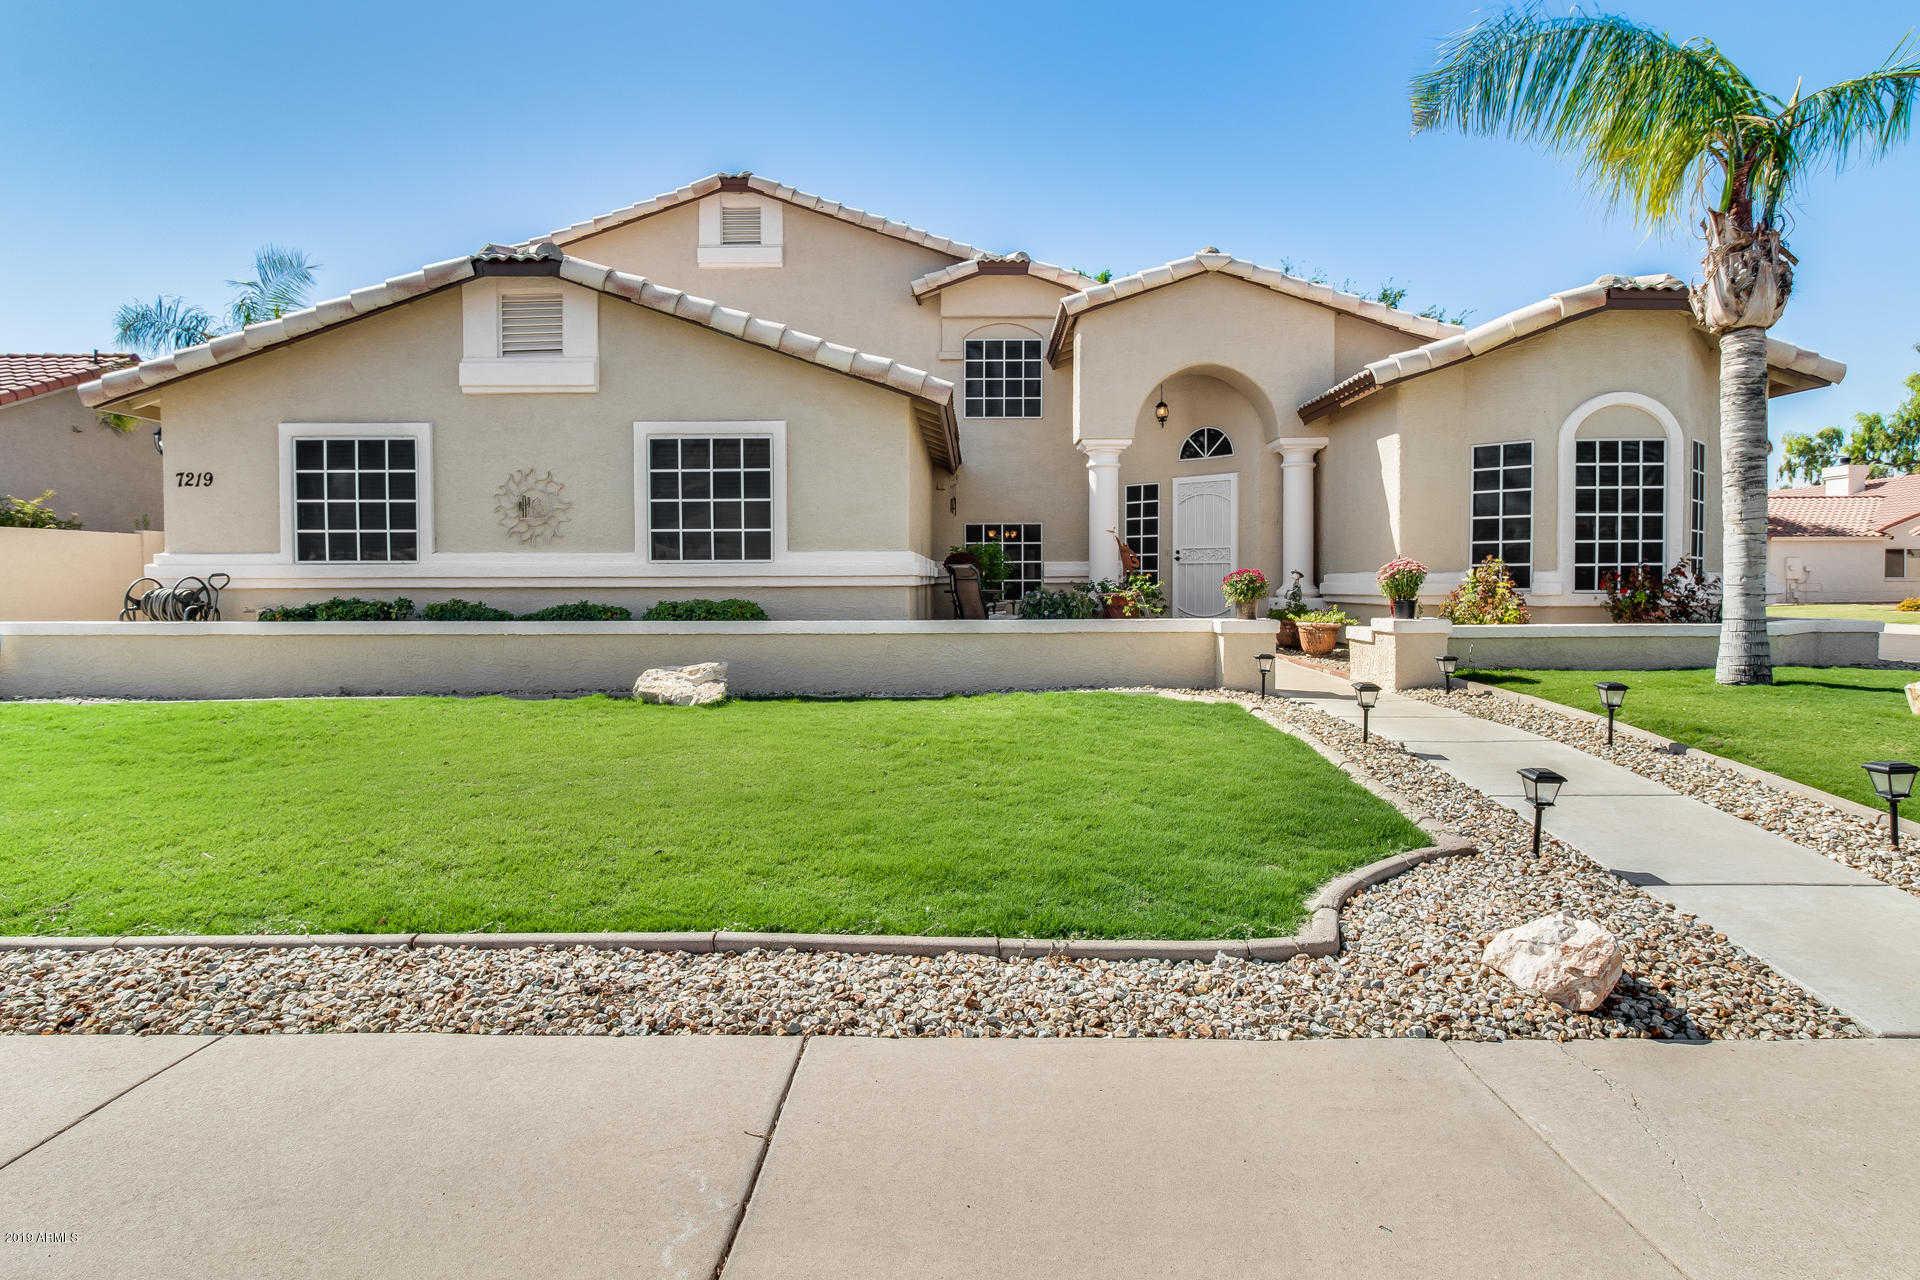 $424,900 - 5Br/3Ba - Home for Sale in Arrowhead Oasis, Glendale